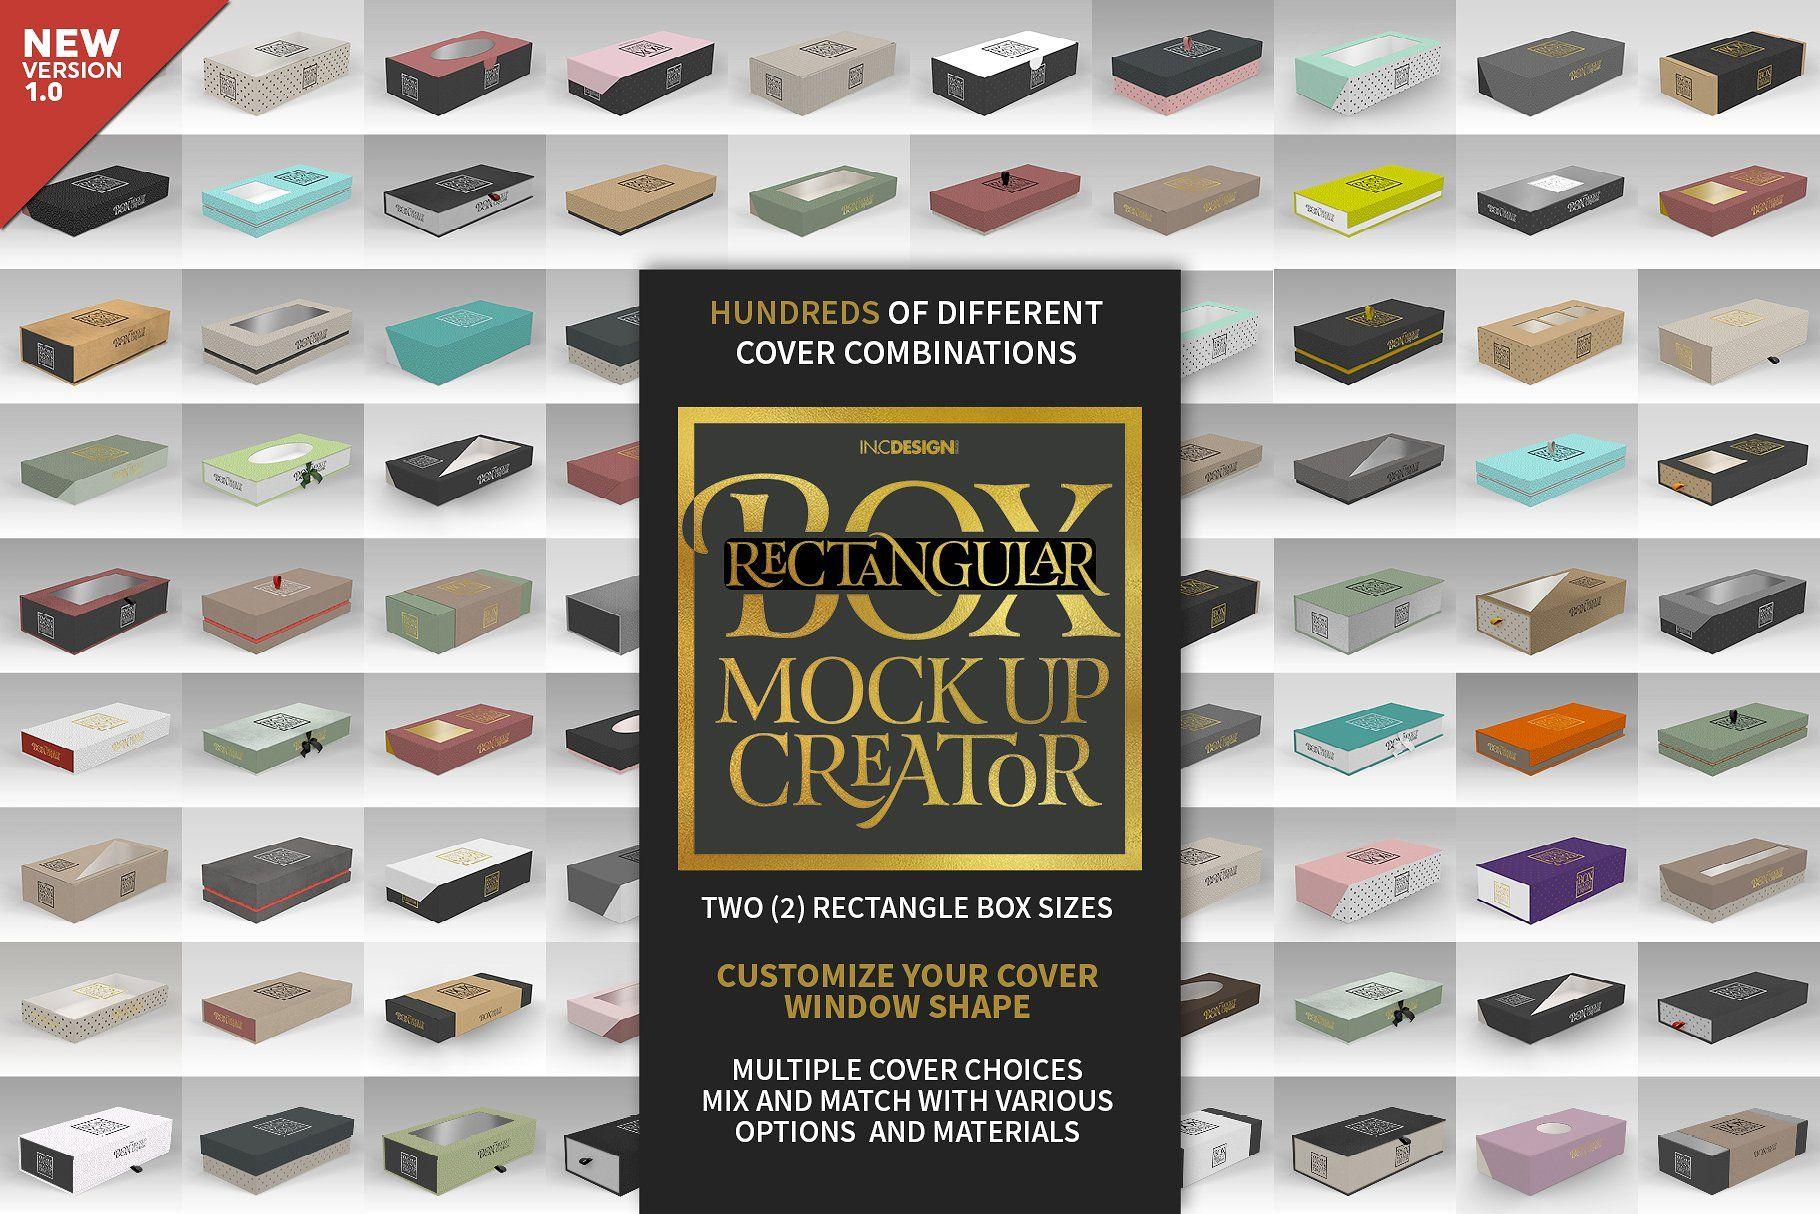 Download Rectangular Box Mock Up Creator Design Mockup Free Mockup Template Free Mockup